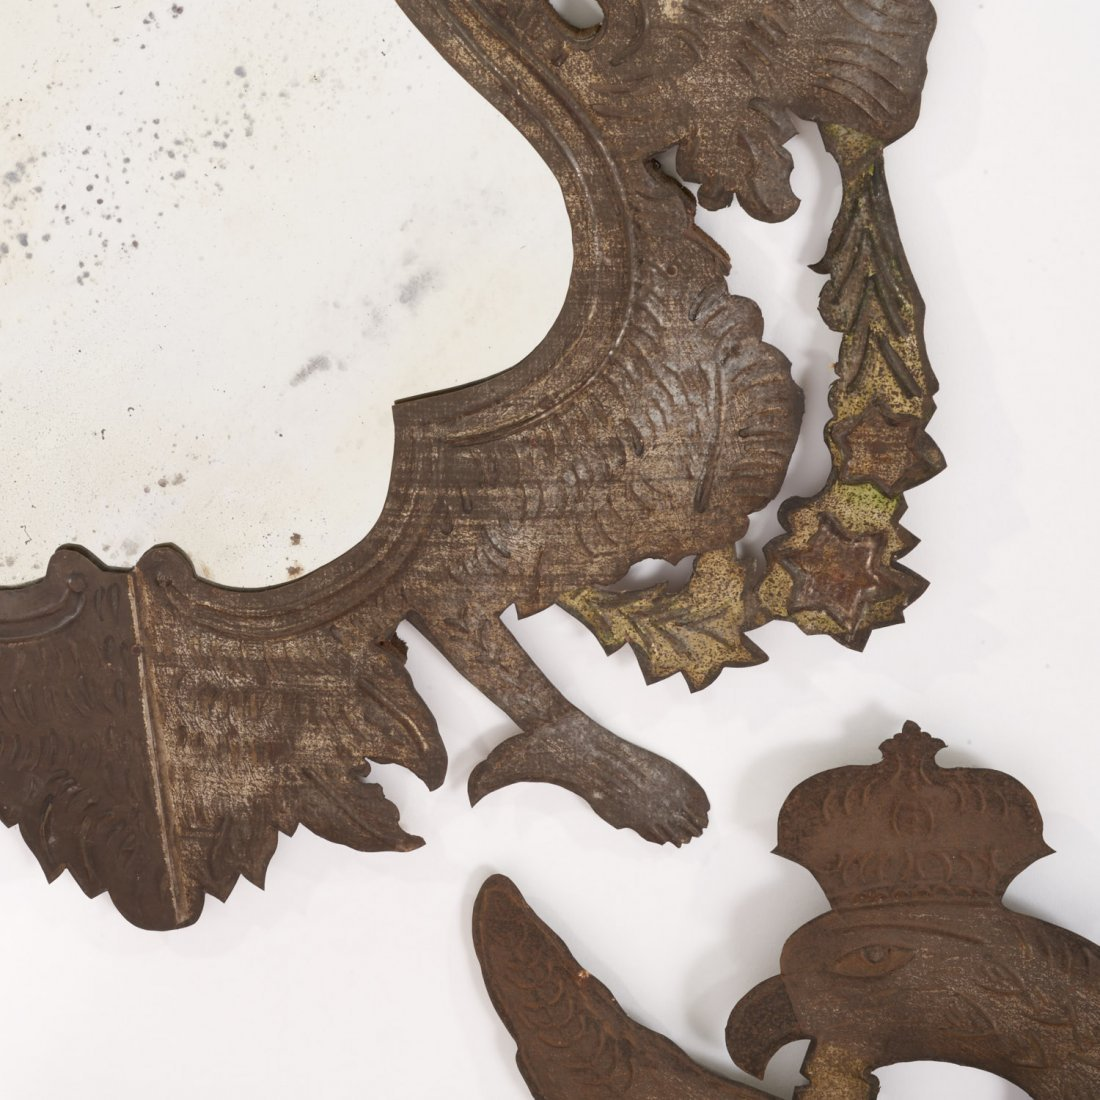 Pr Spanish Colonial style gilt metal wall mirrors - 3